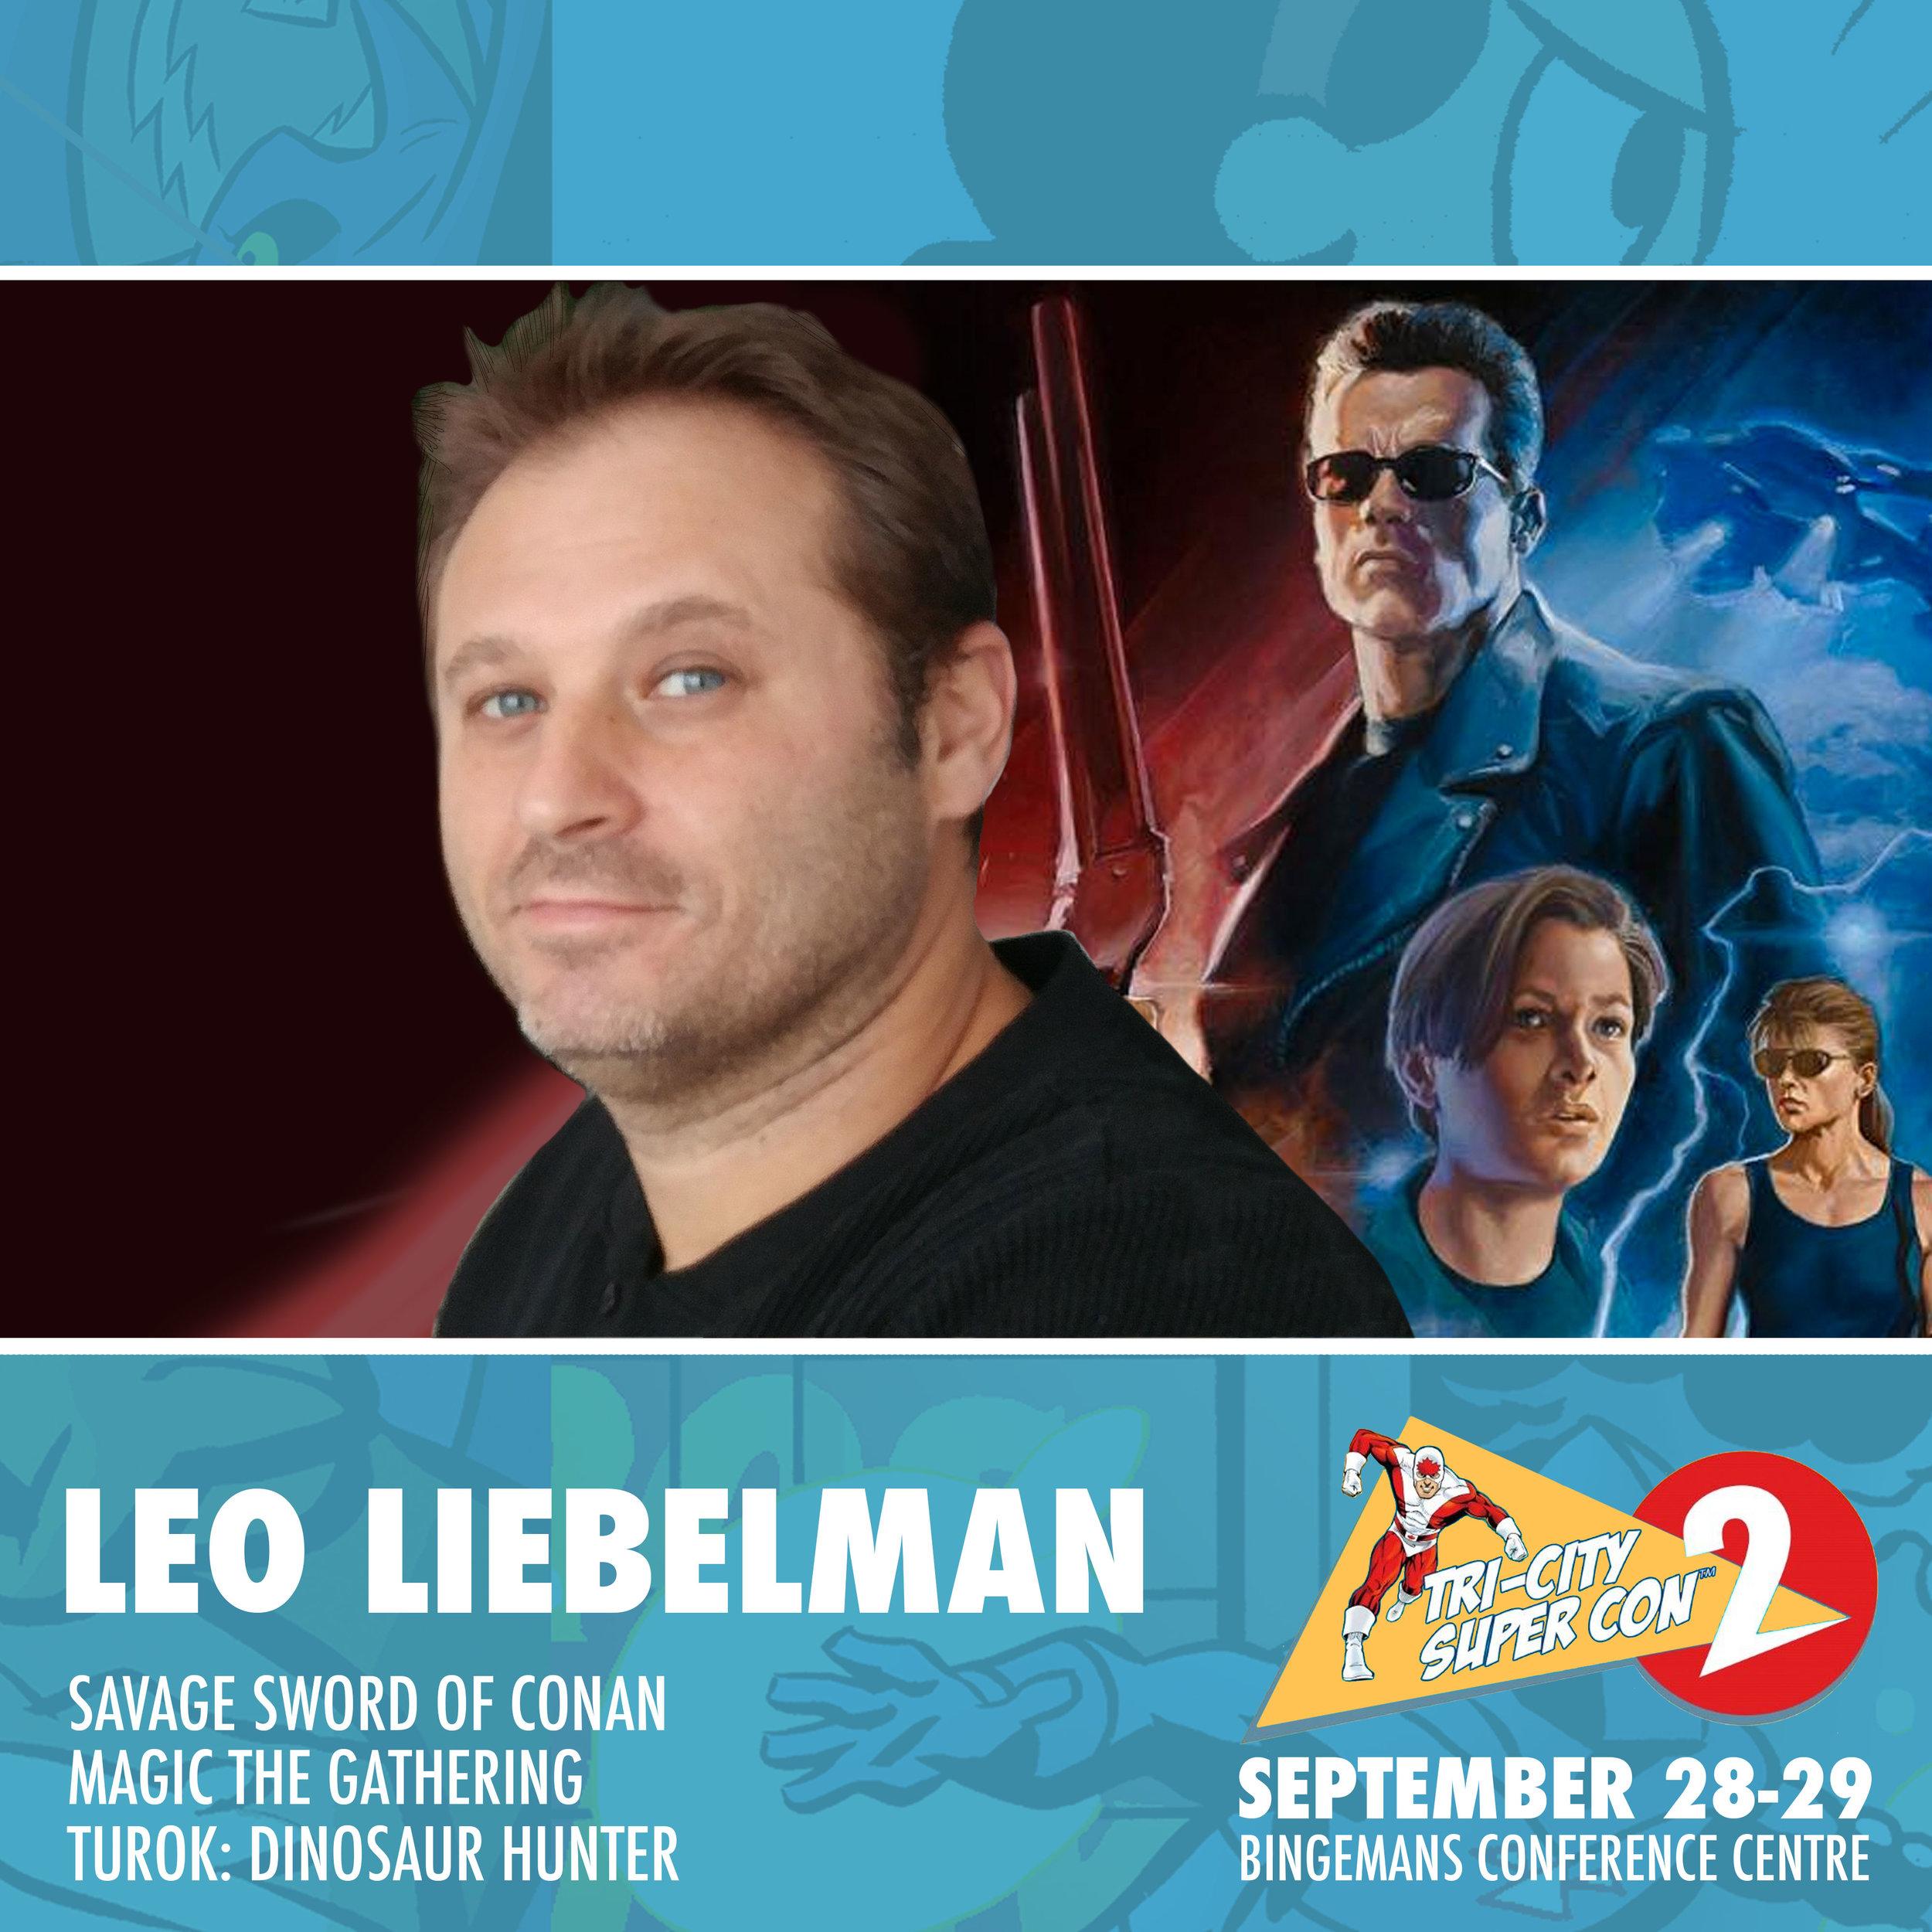 Leo-Libelman.jpg